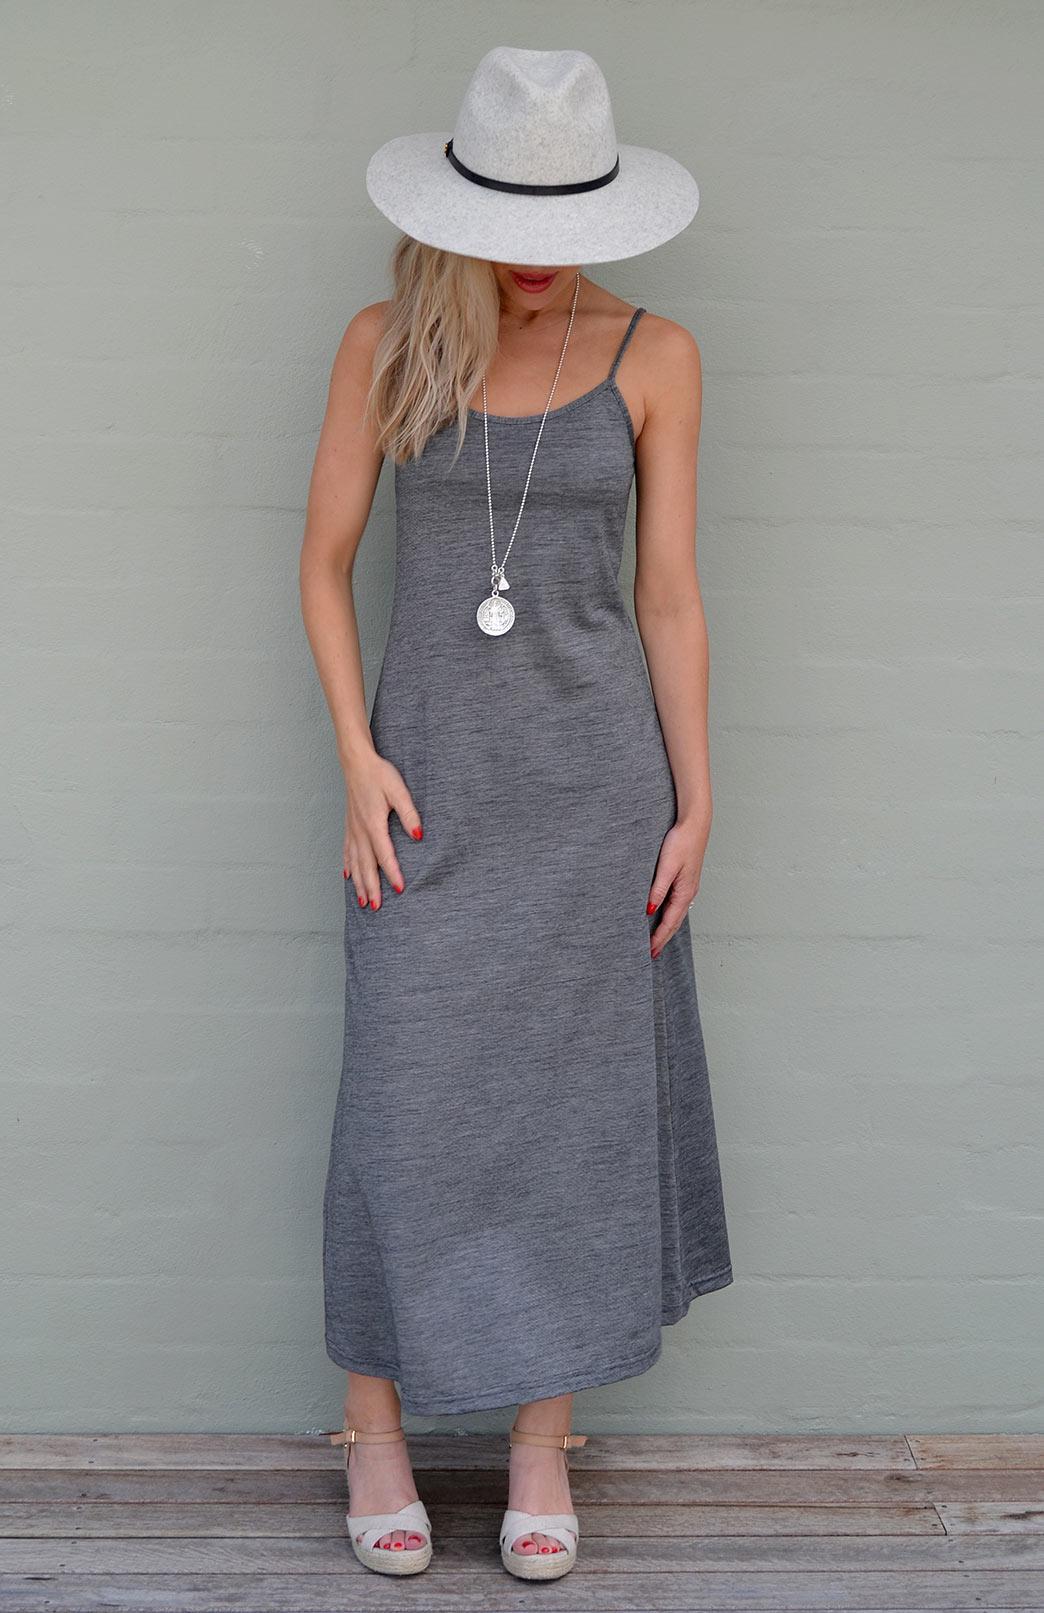 Cami Maxi Dress - Women's Organic Cotton and Merino Wool Fine Black and White Stripe Cami Maxi Dress - Smitten Merino Tasmania Australia